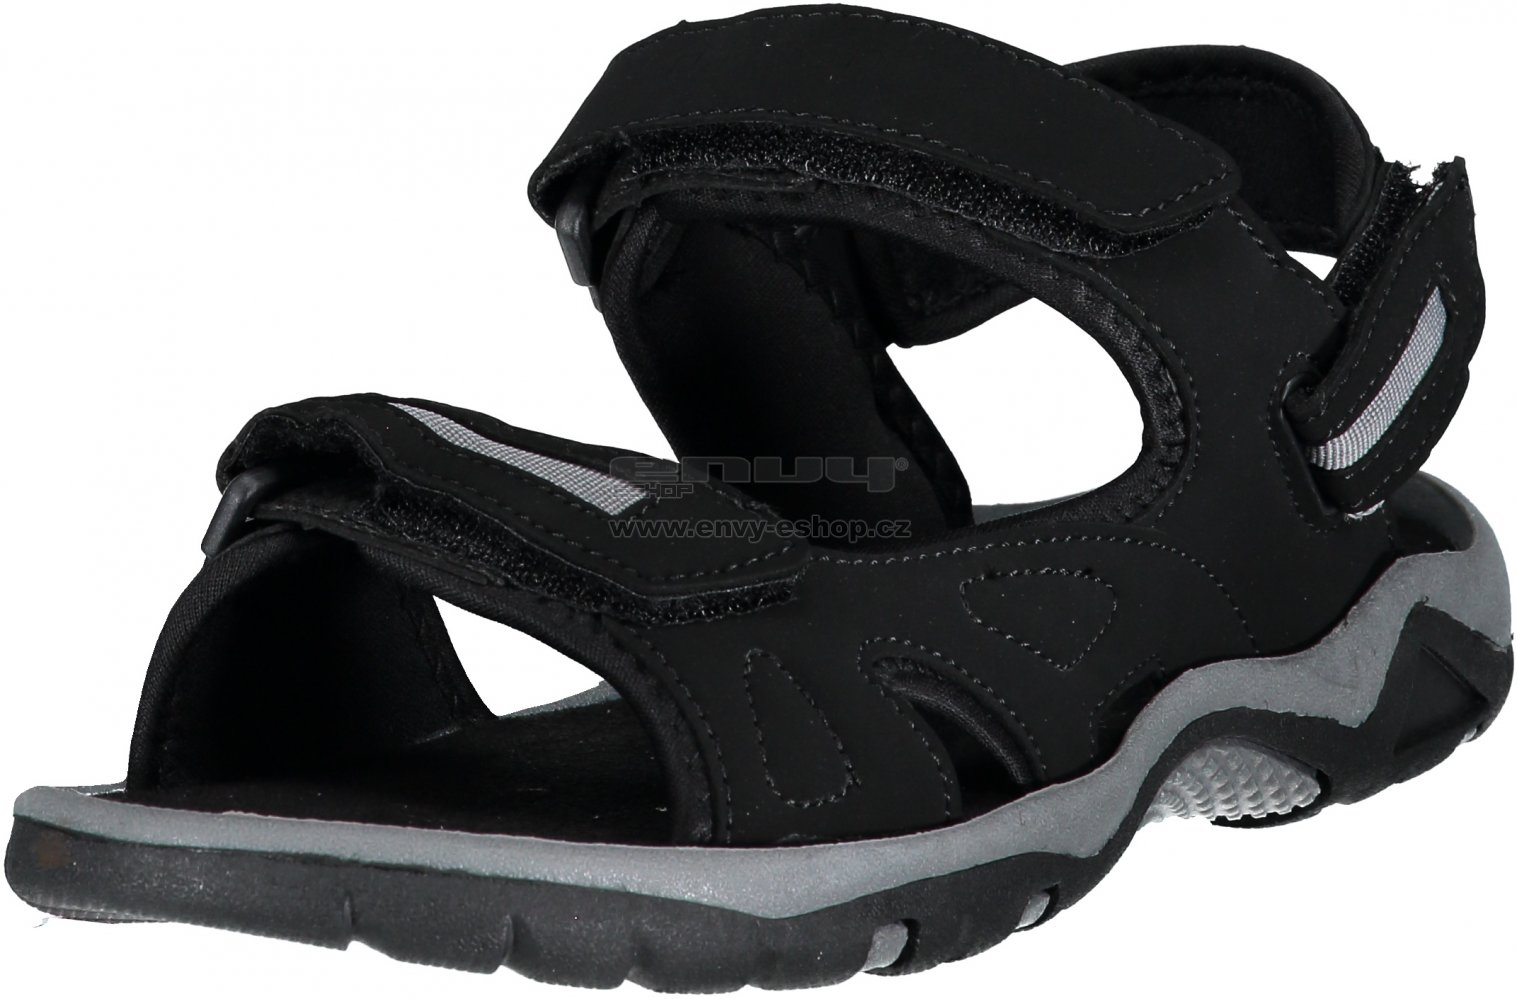 eeae9d565011 Pánské sandále LOAP HELIGT SSM1962 ČERNÁ velikost  EU 41 (UK 7